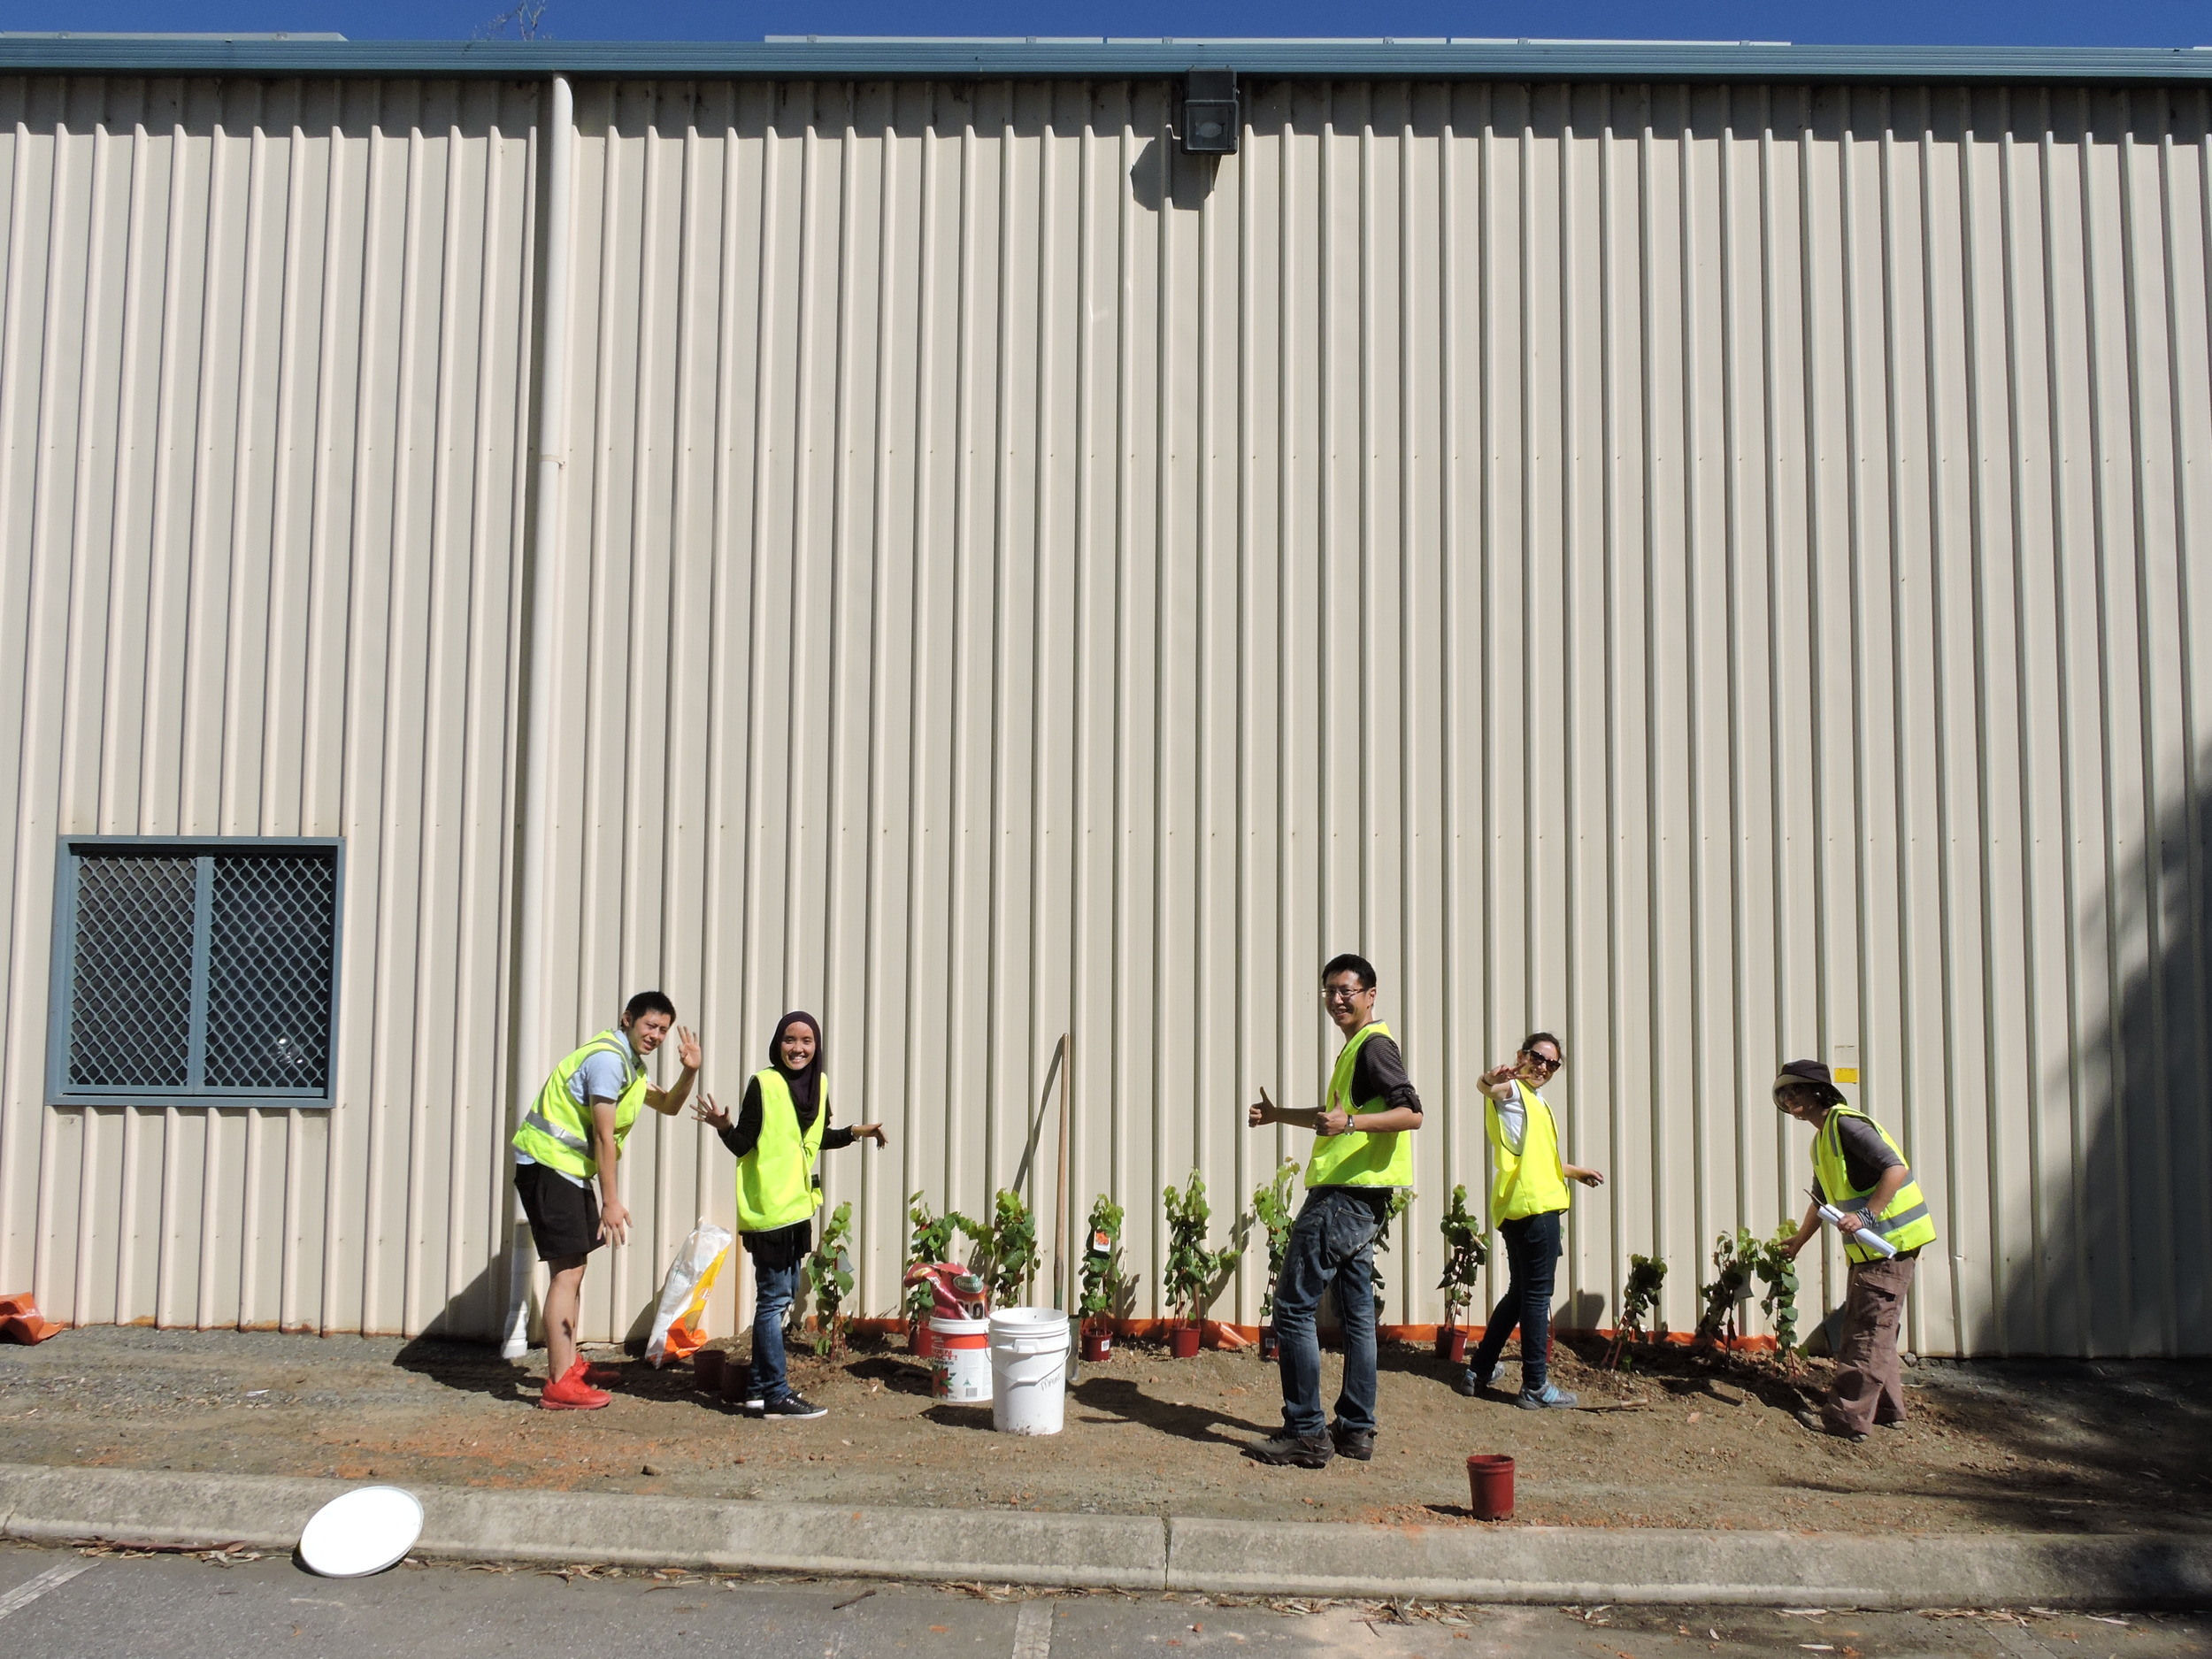 20160321_JQF04_urban planting (46).JPG